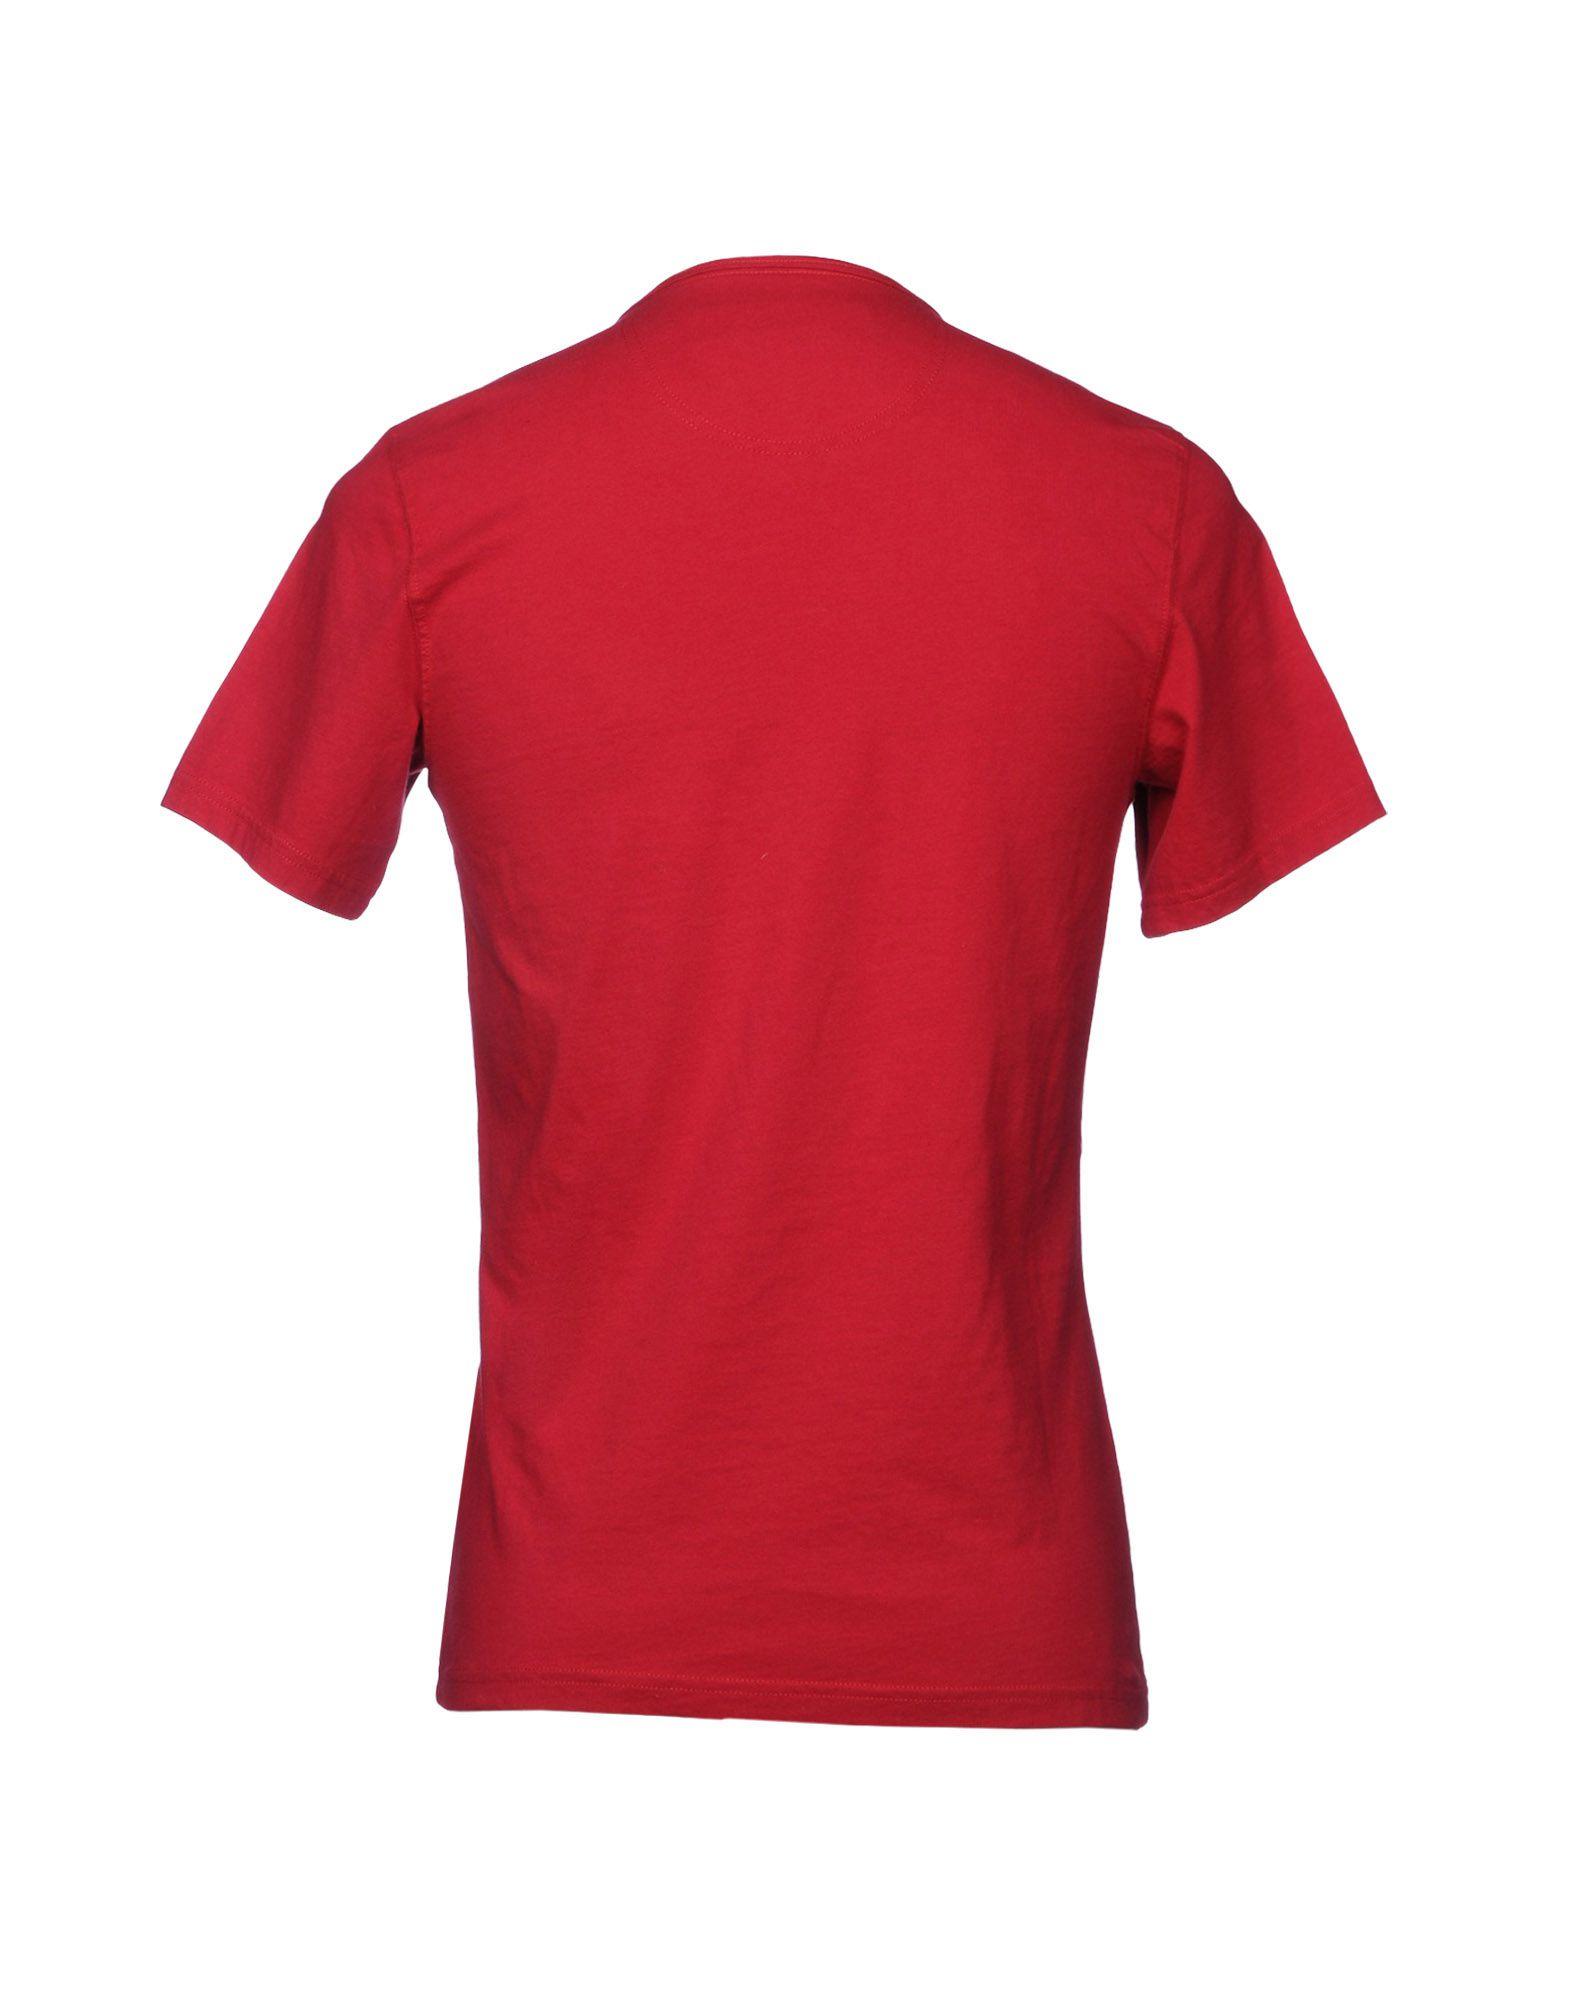 A buon mercato mercato mercato A buon mercato T-Shirt Barbour Uomo - 12116522XV 696cd4